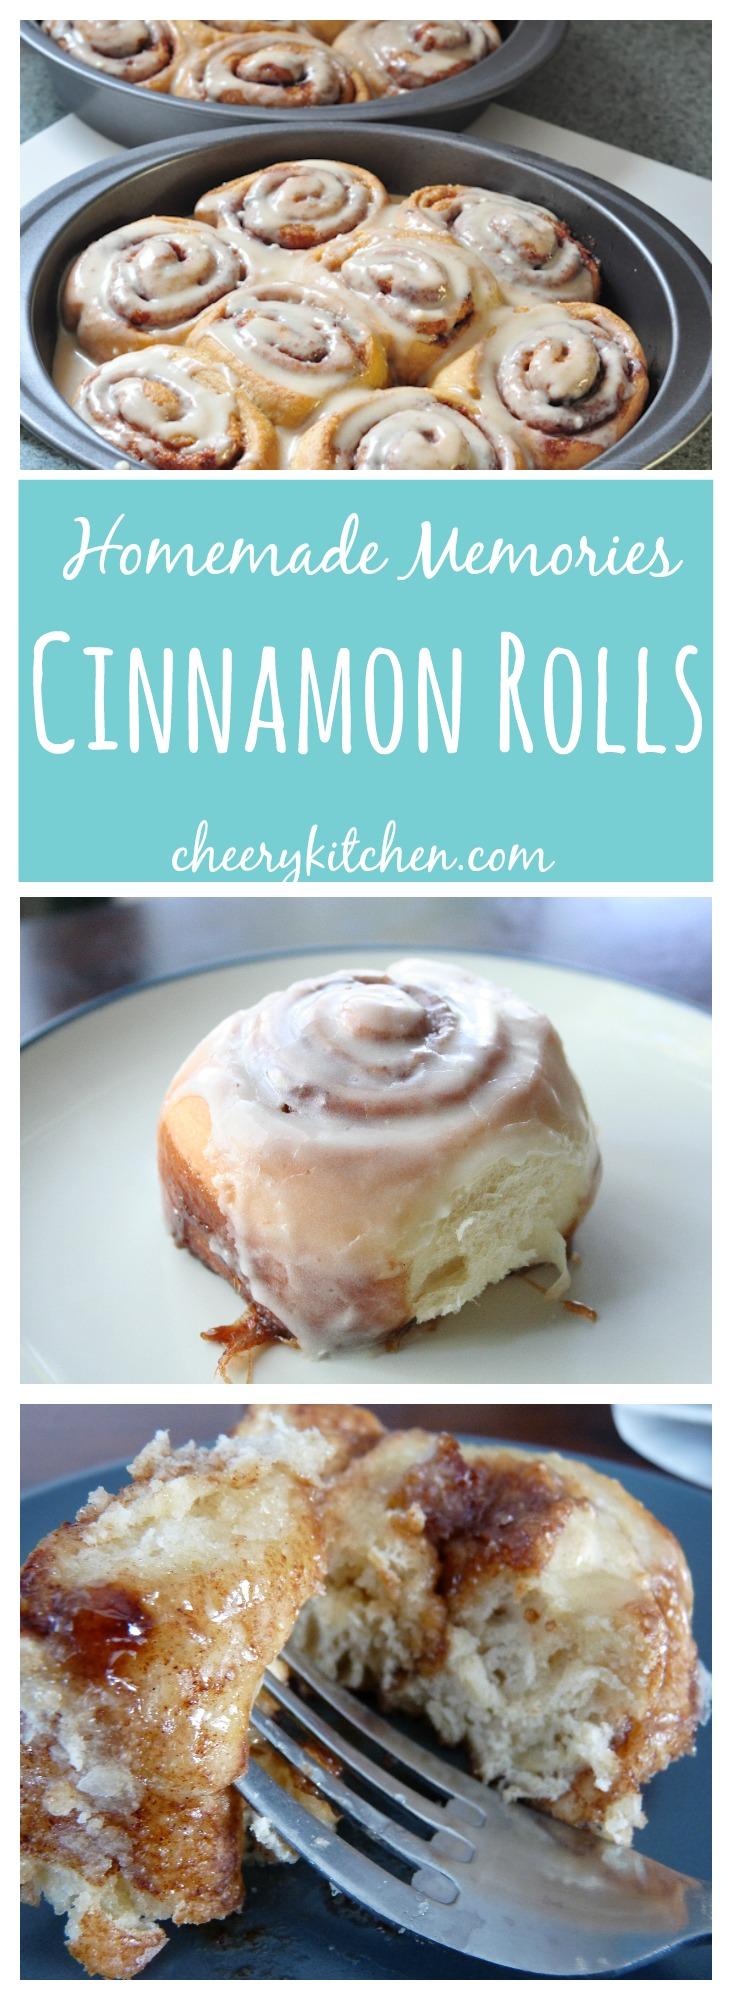 Cinnamon rolls create memories in my household. Learn a 90 minute cinnamon roll recipe, tips on how to make cinnamon rolls wrapped in memories.